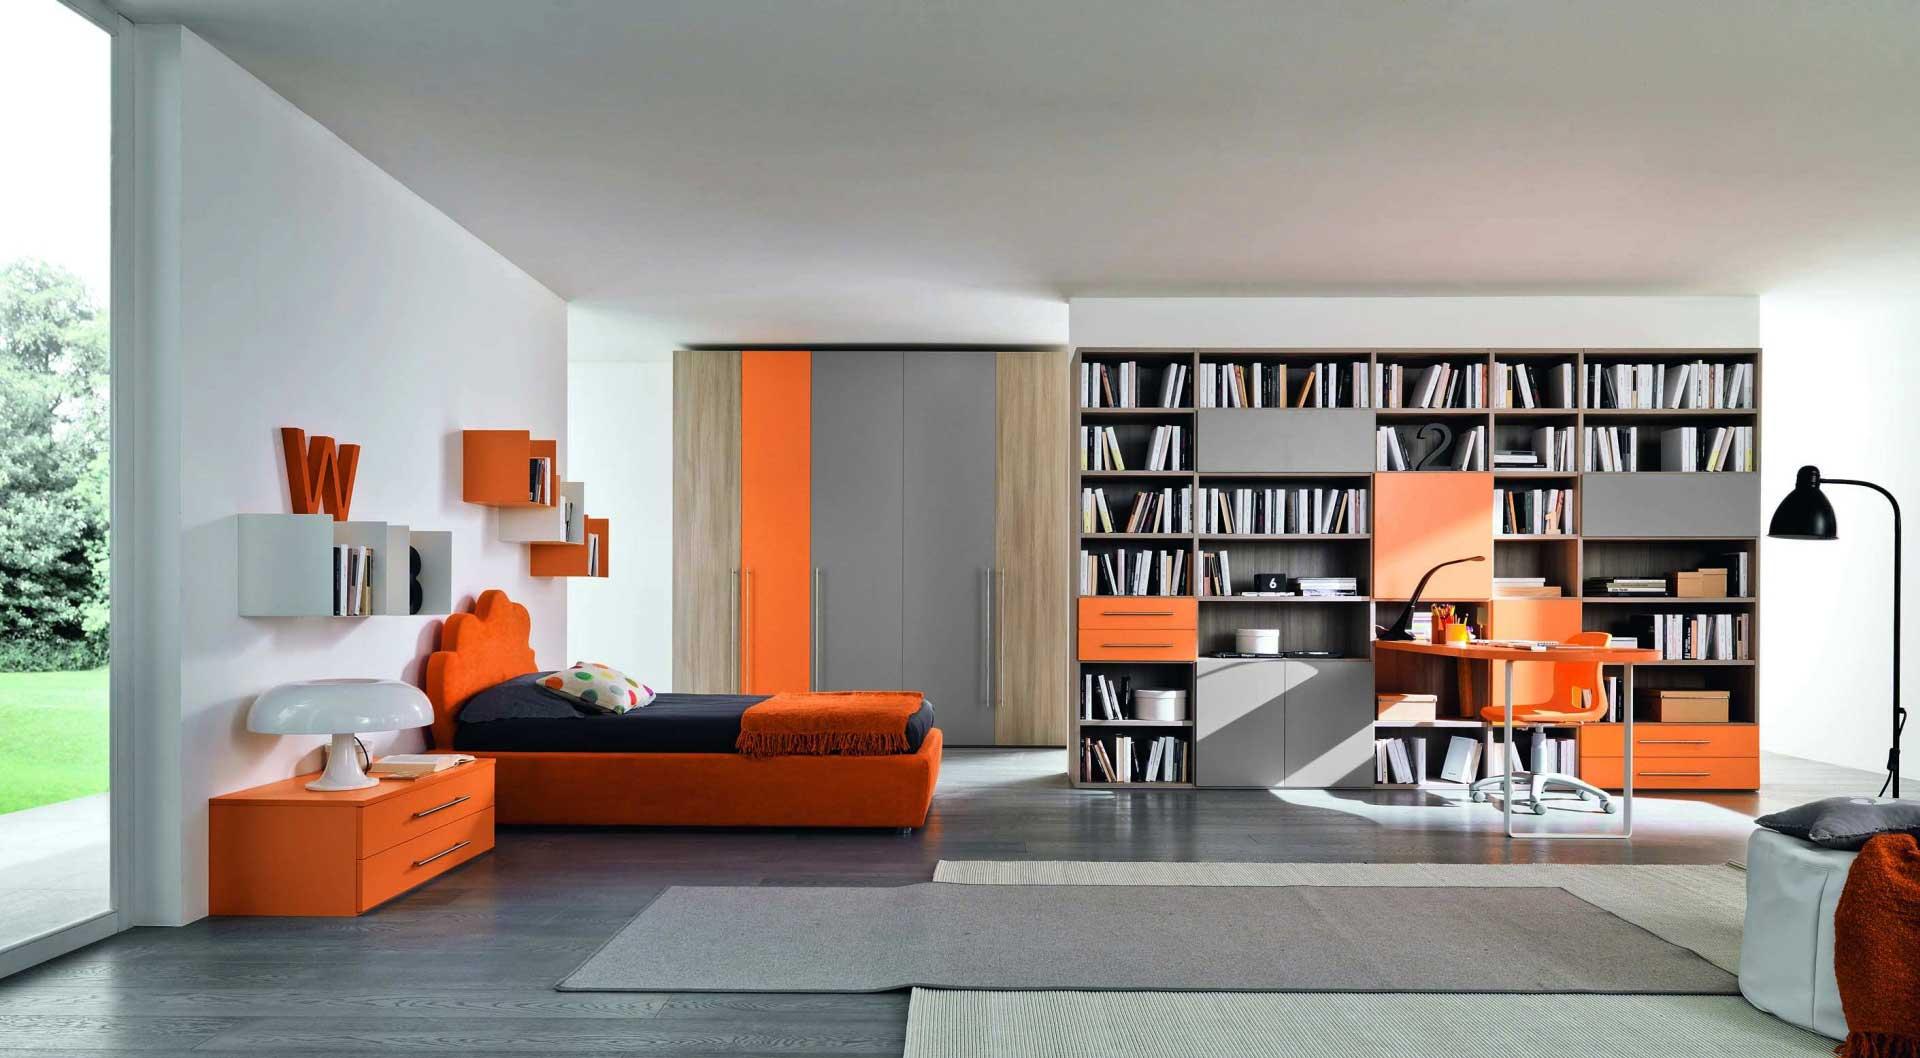 Arredare una casa di 60mq - Ikea bari camerette ...